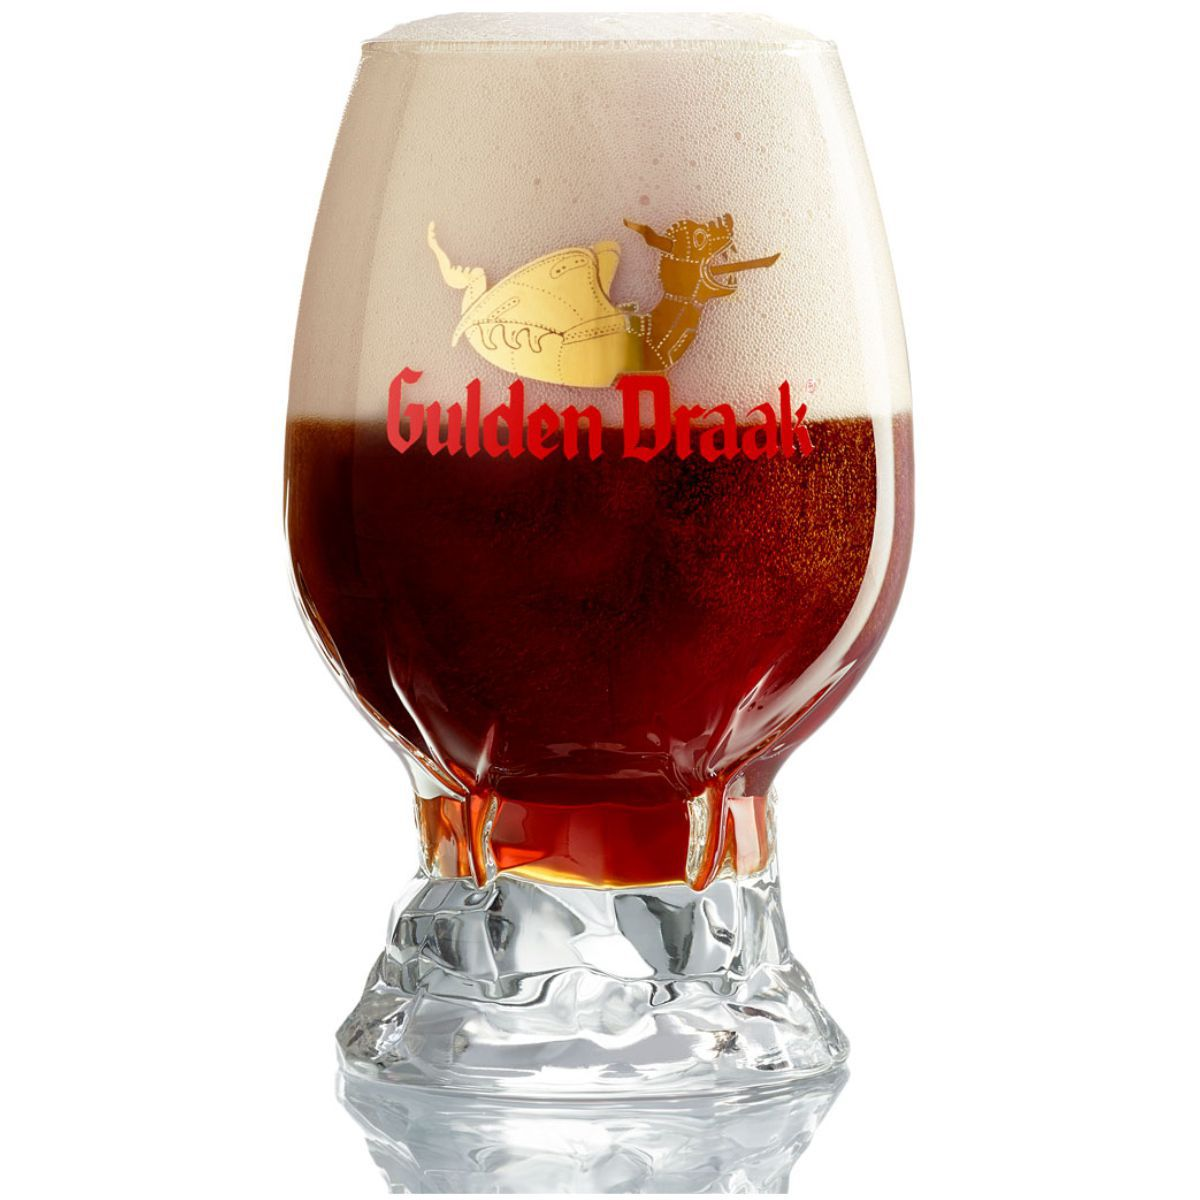 Taça Gulden Draak (Ovo de dragão) 330ml